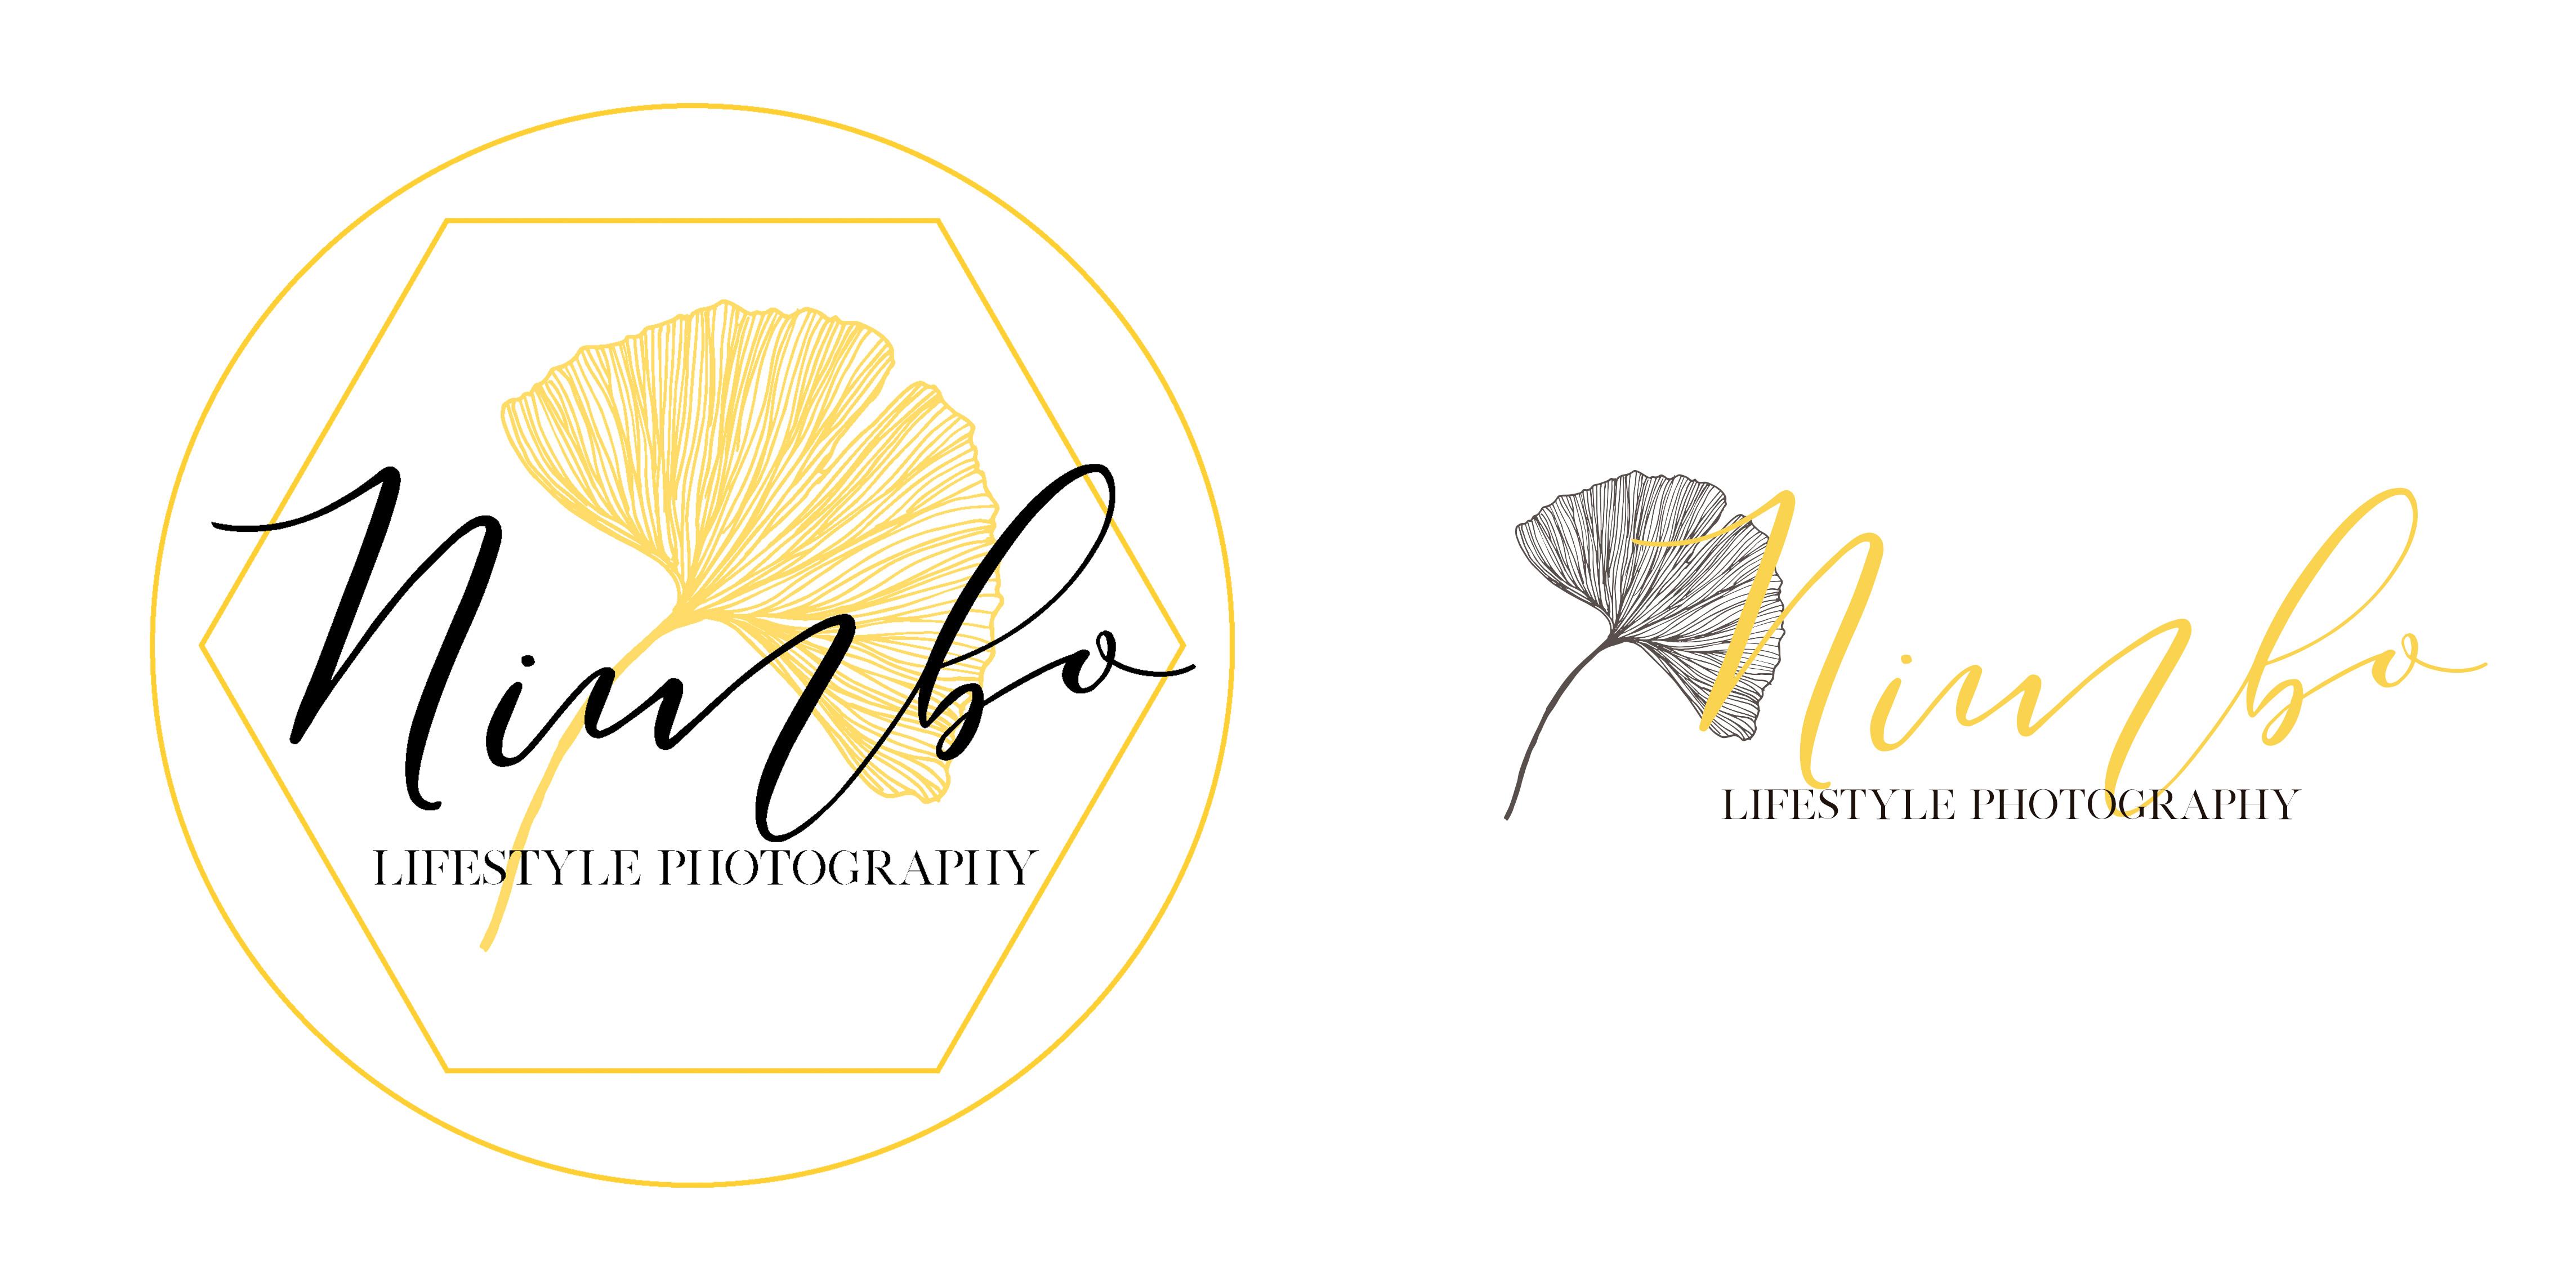 Empresa de Branding Vitoria - Logotipo Vitoria